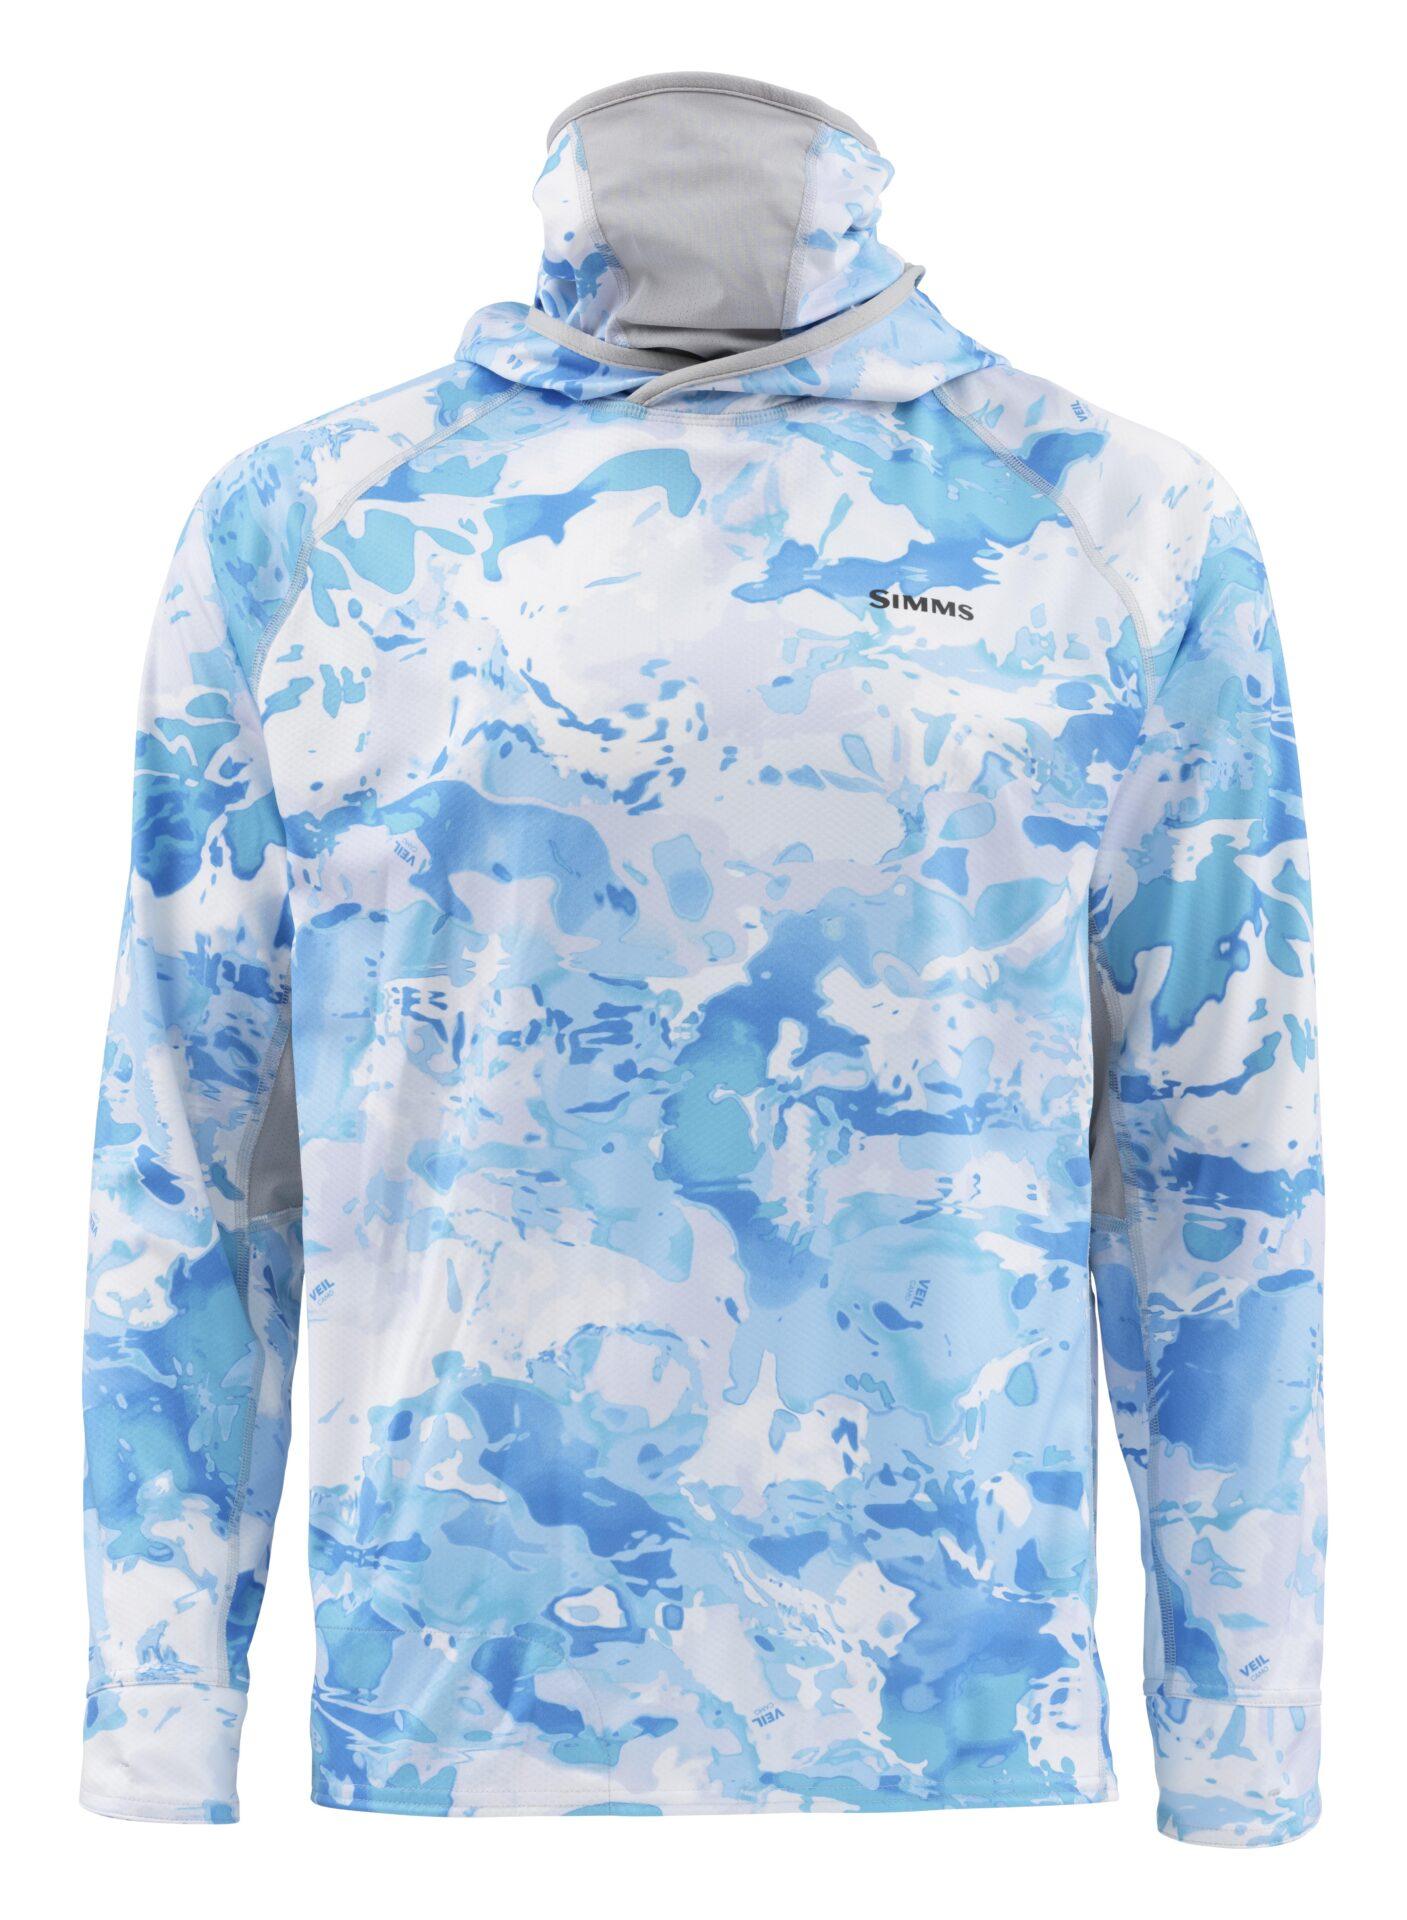 Simms SolarFlex UltraCool Armor Shirt